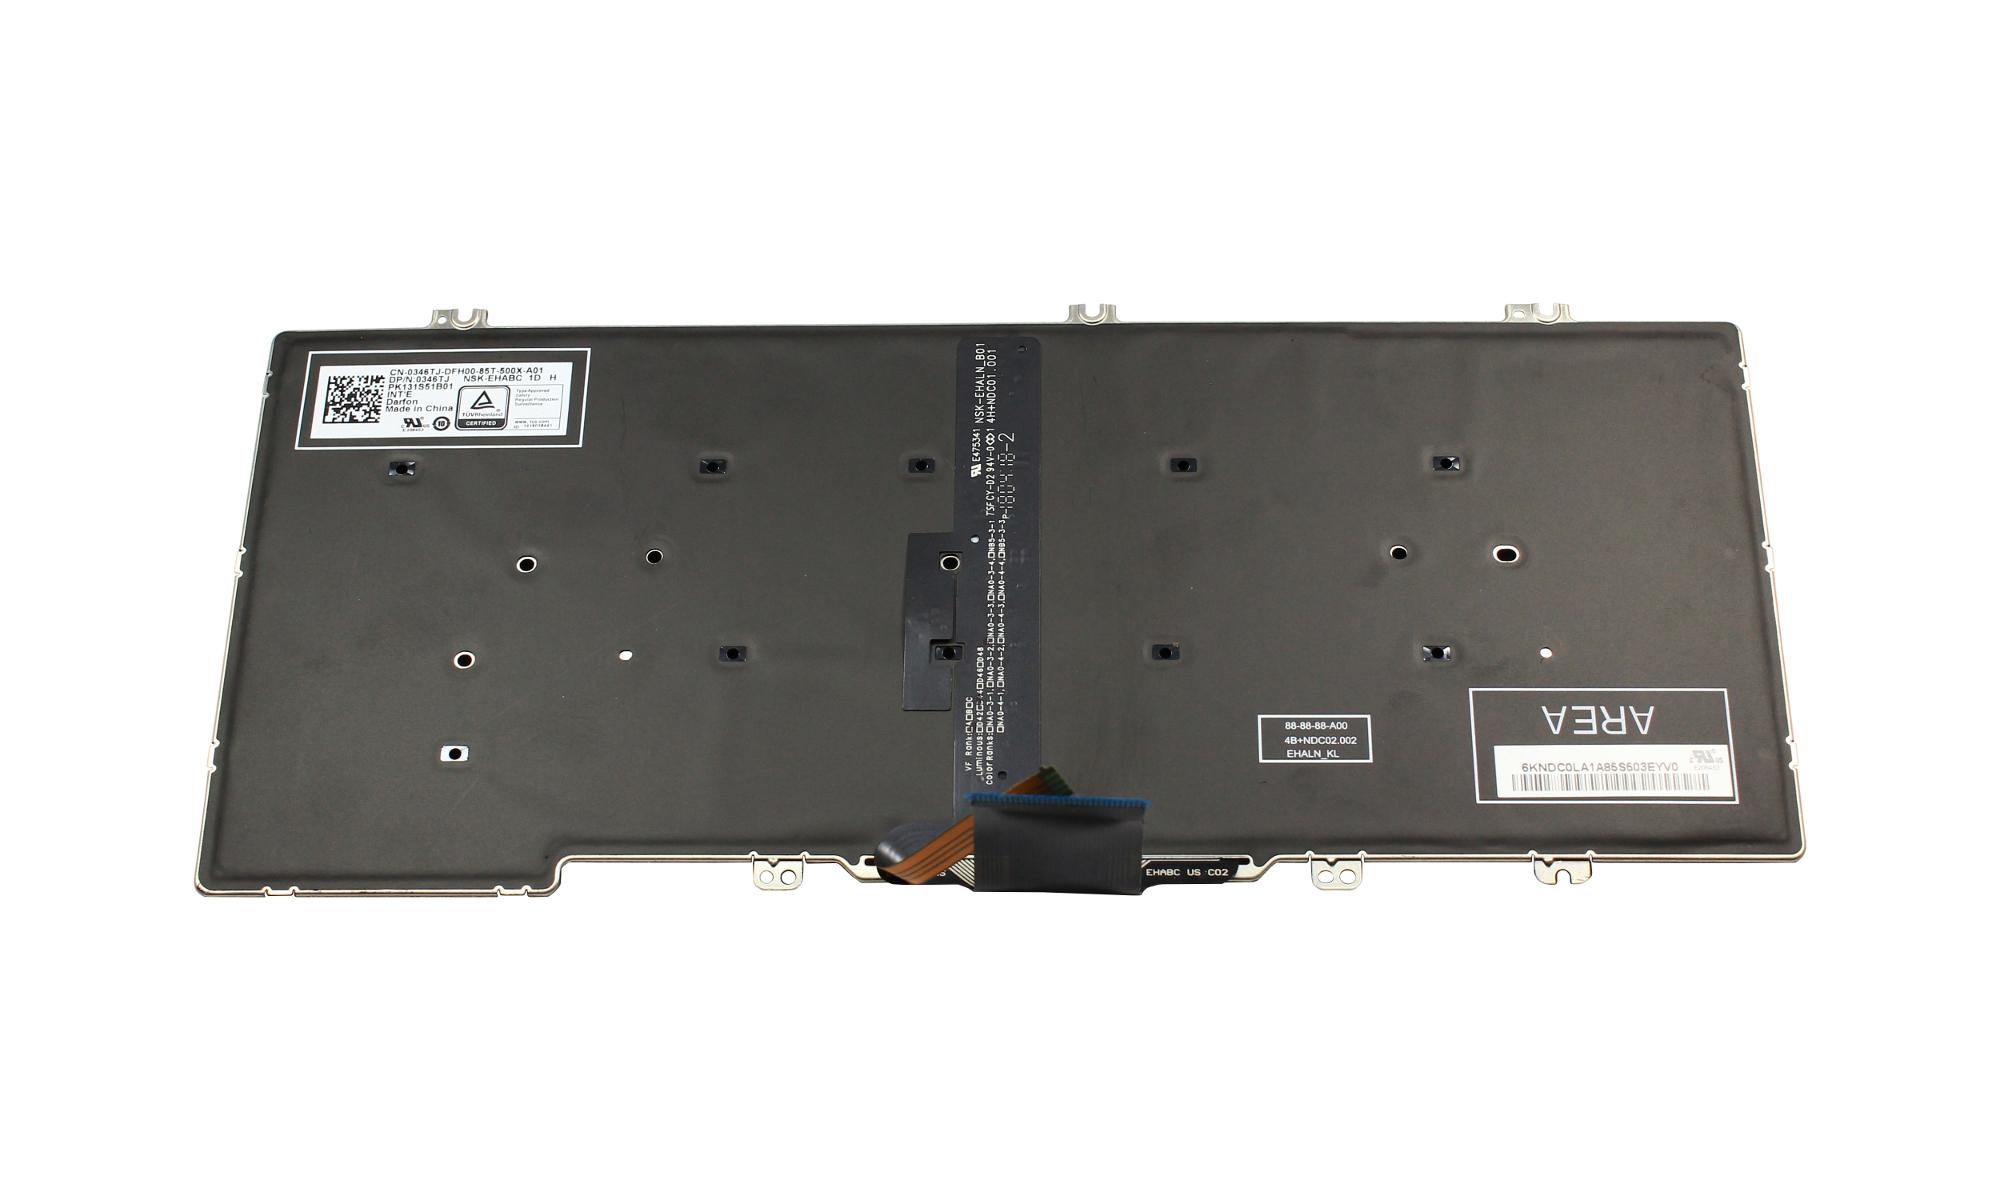 Tastatura originala Dell Latitude 7380 iluminata, layout US